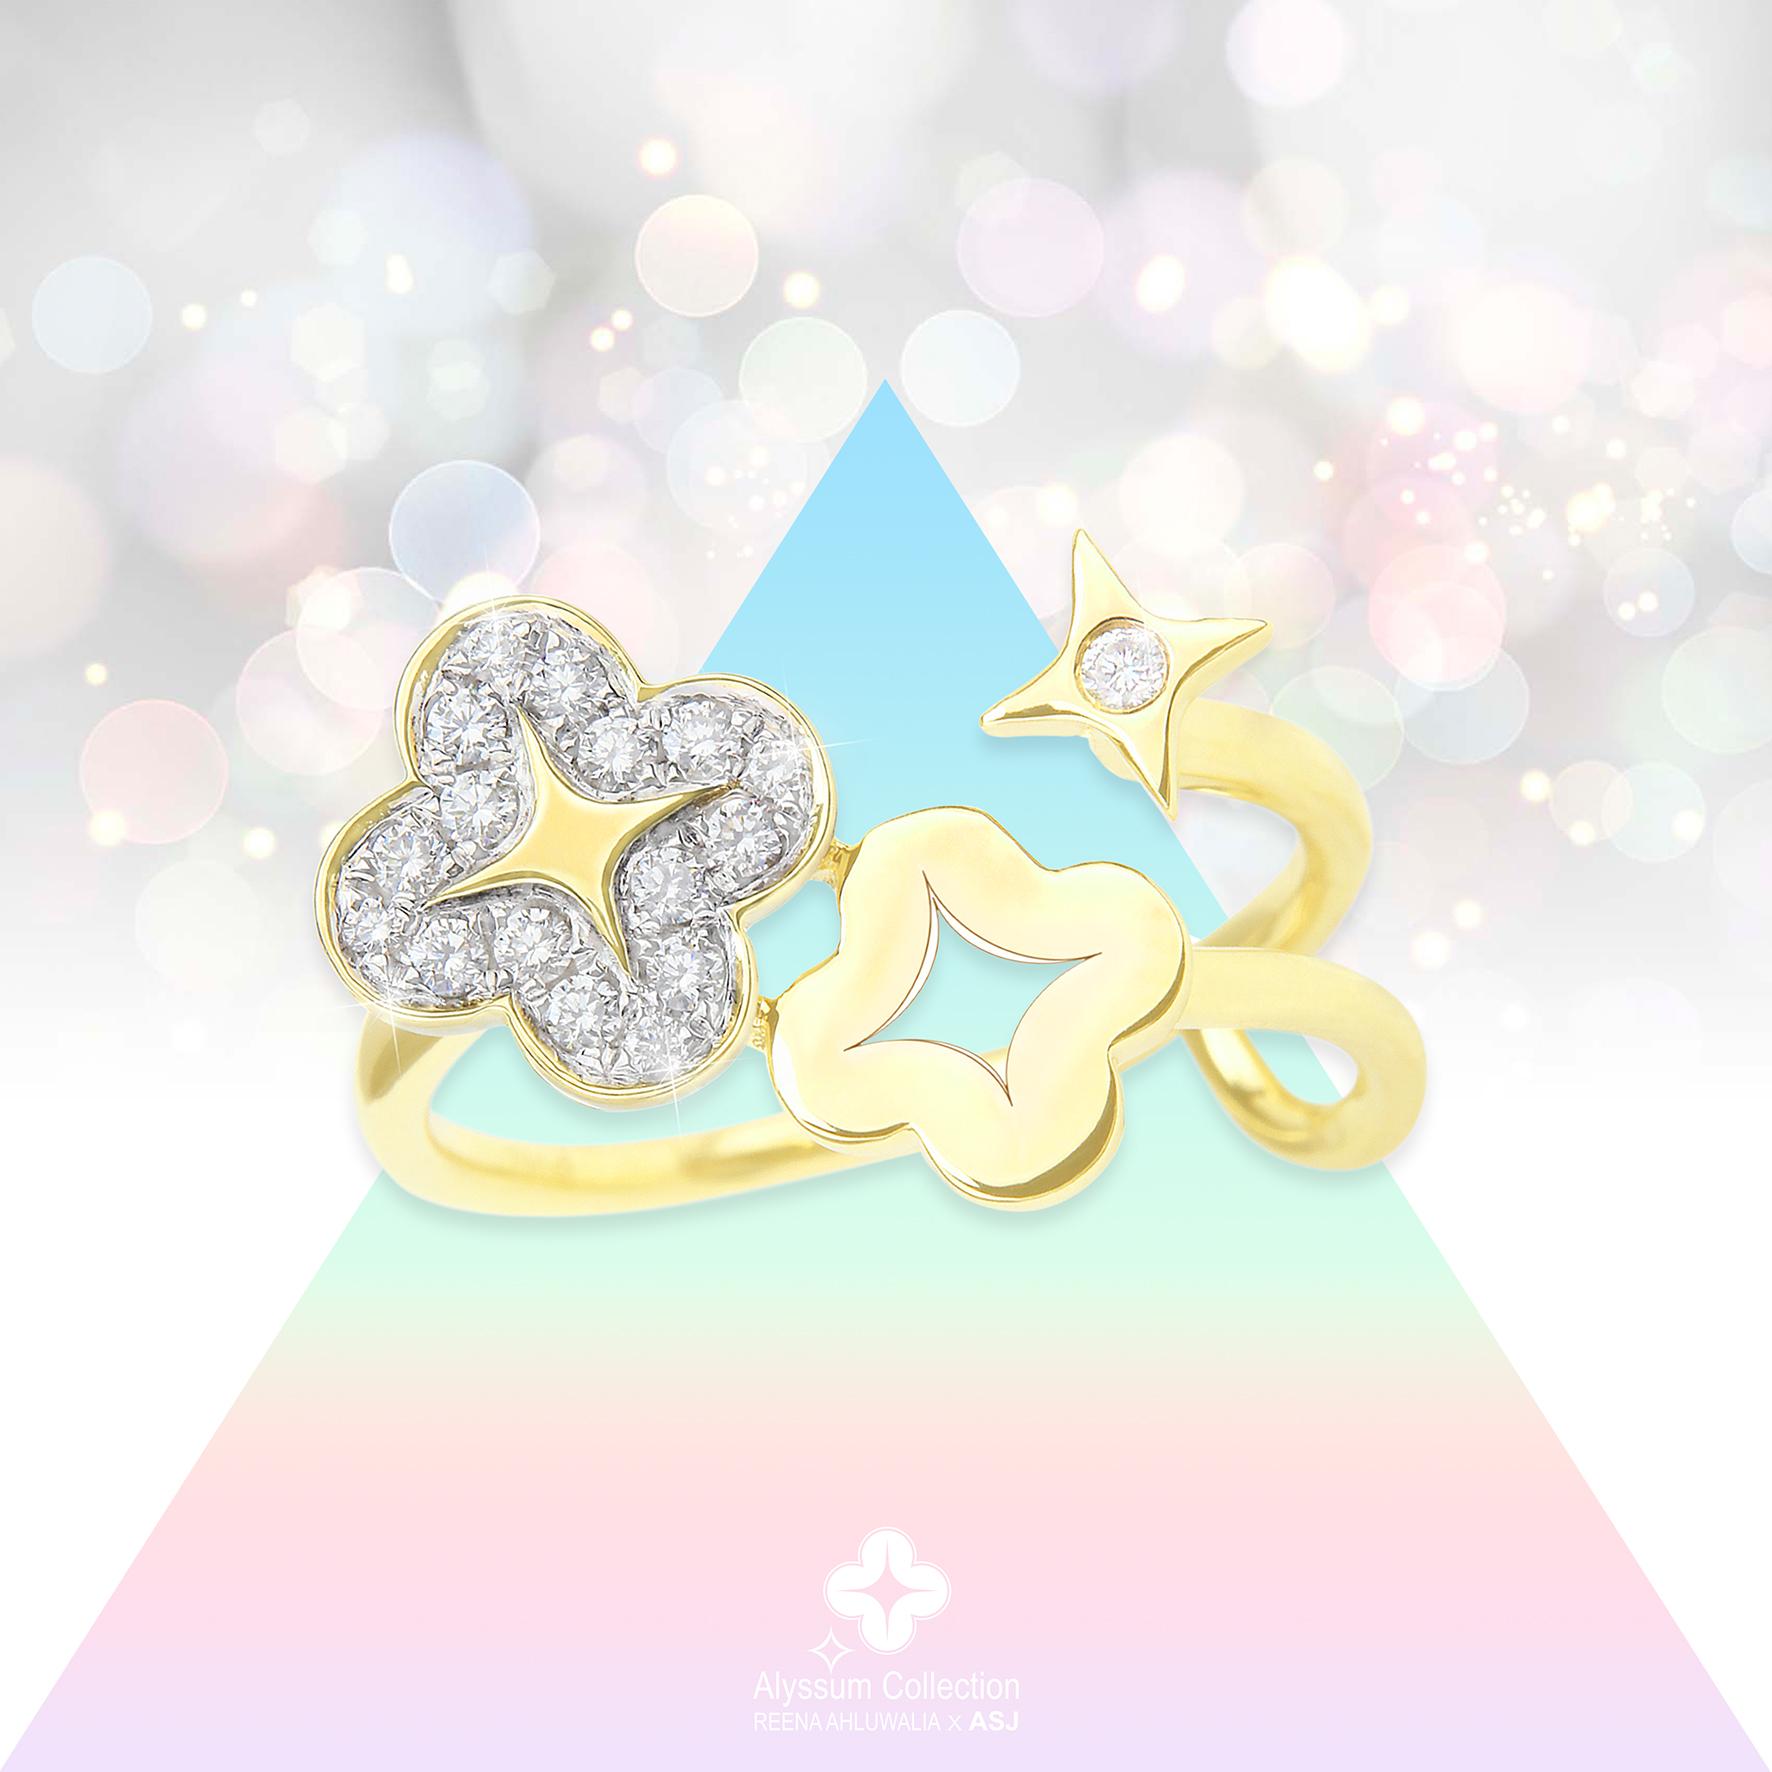 5Alyssum By Reena Ahluwalia_Diamonds_Gold_Collection.jpg